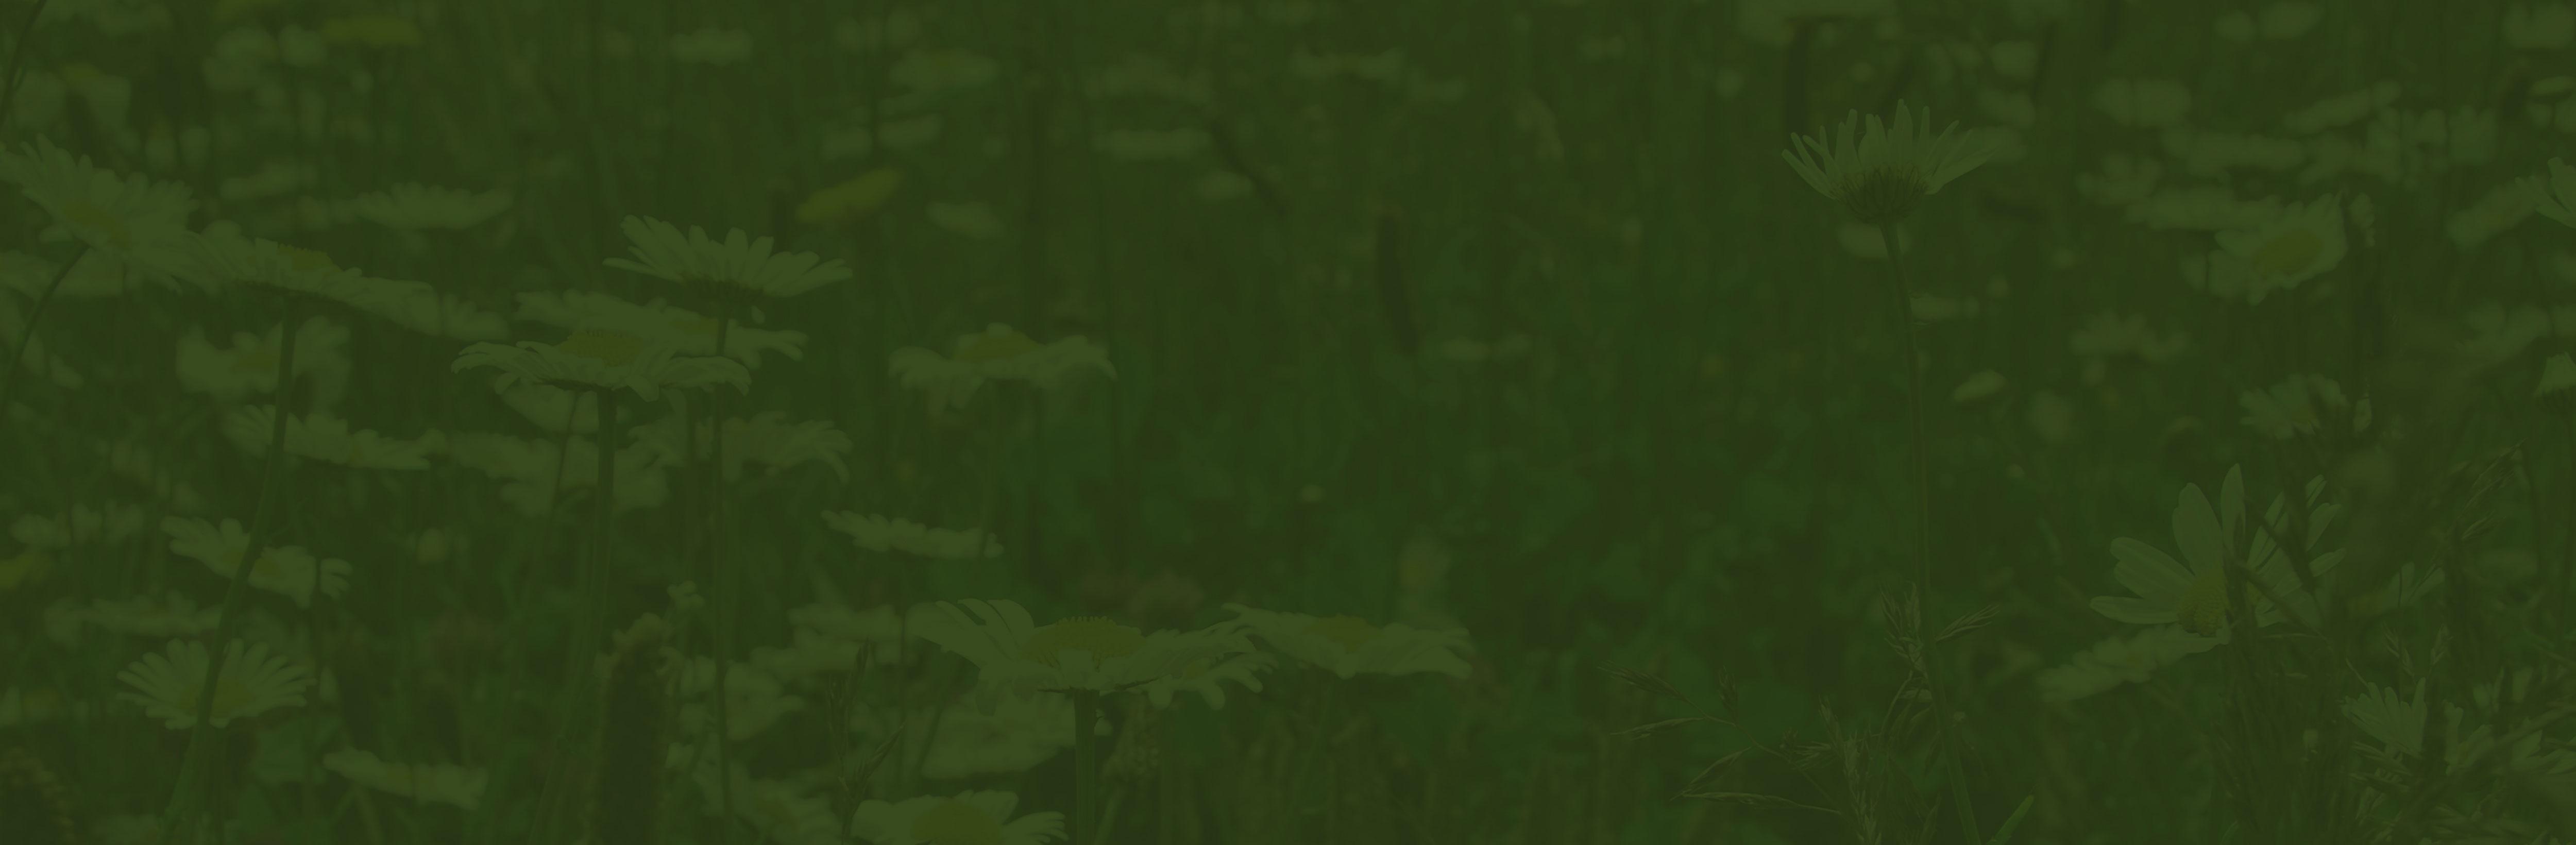 Vegetation Blankets | Sedum - MIX Type TD | Roof substrates